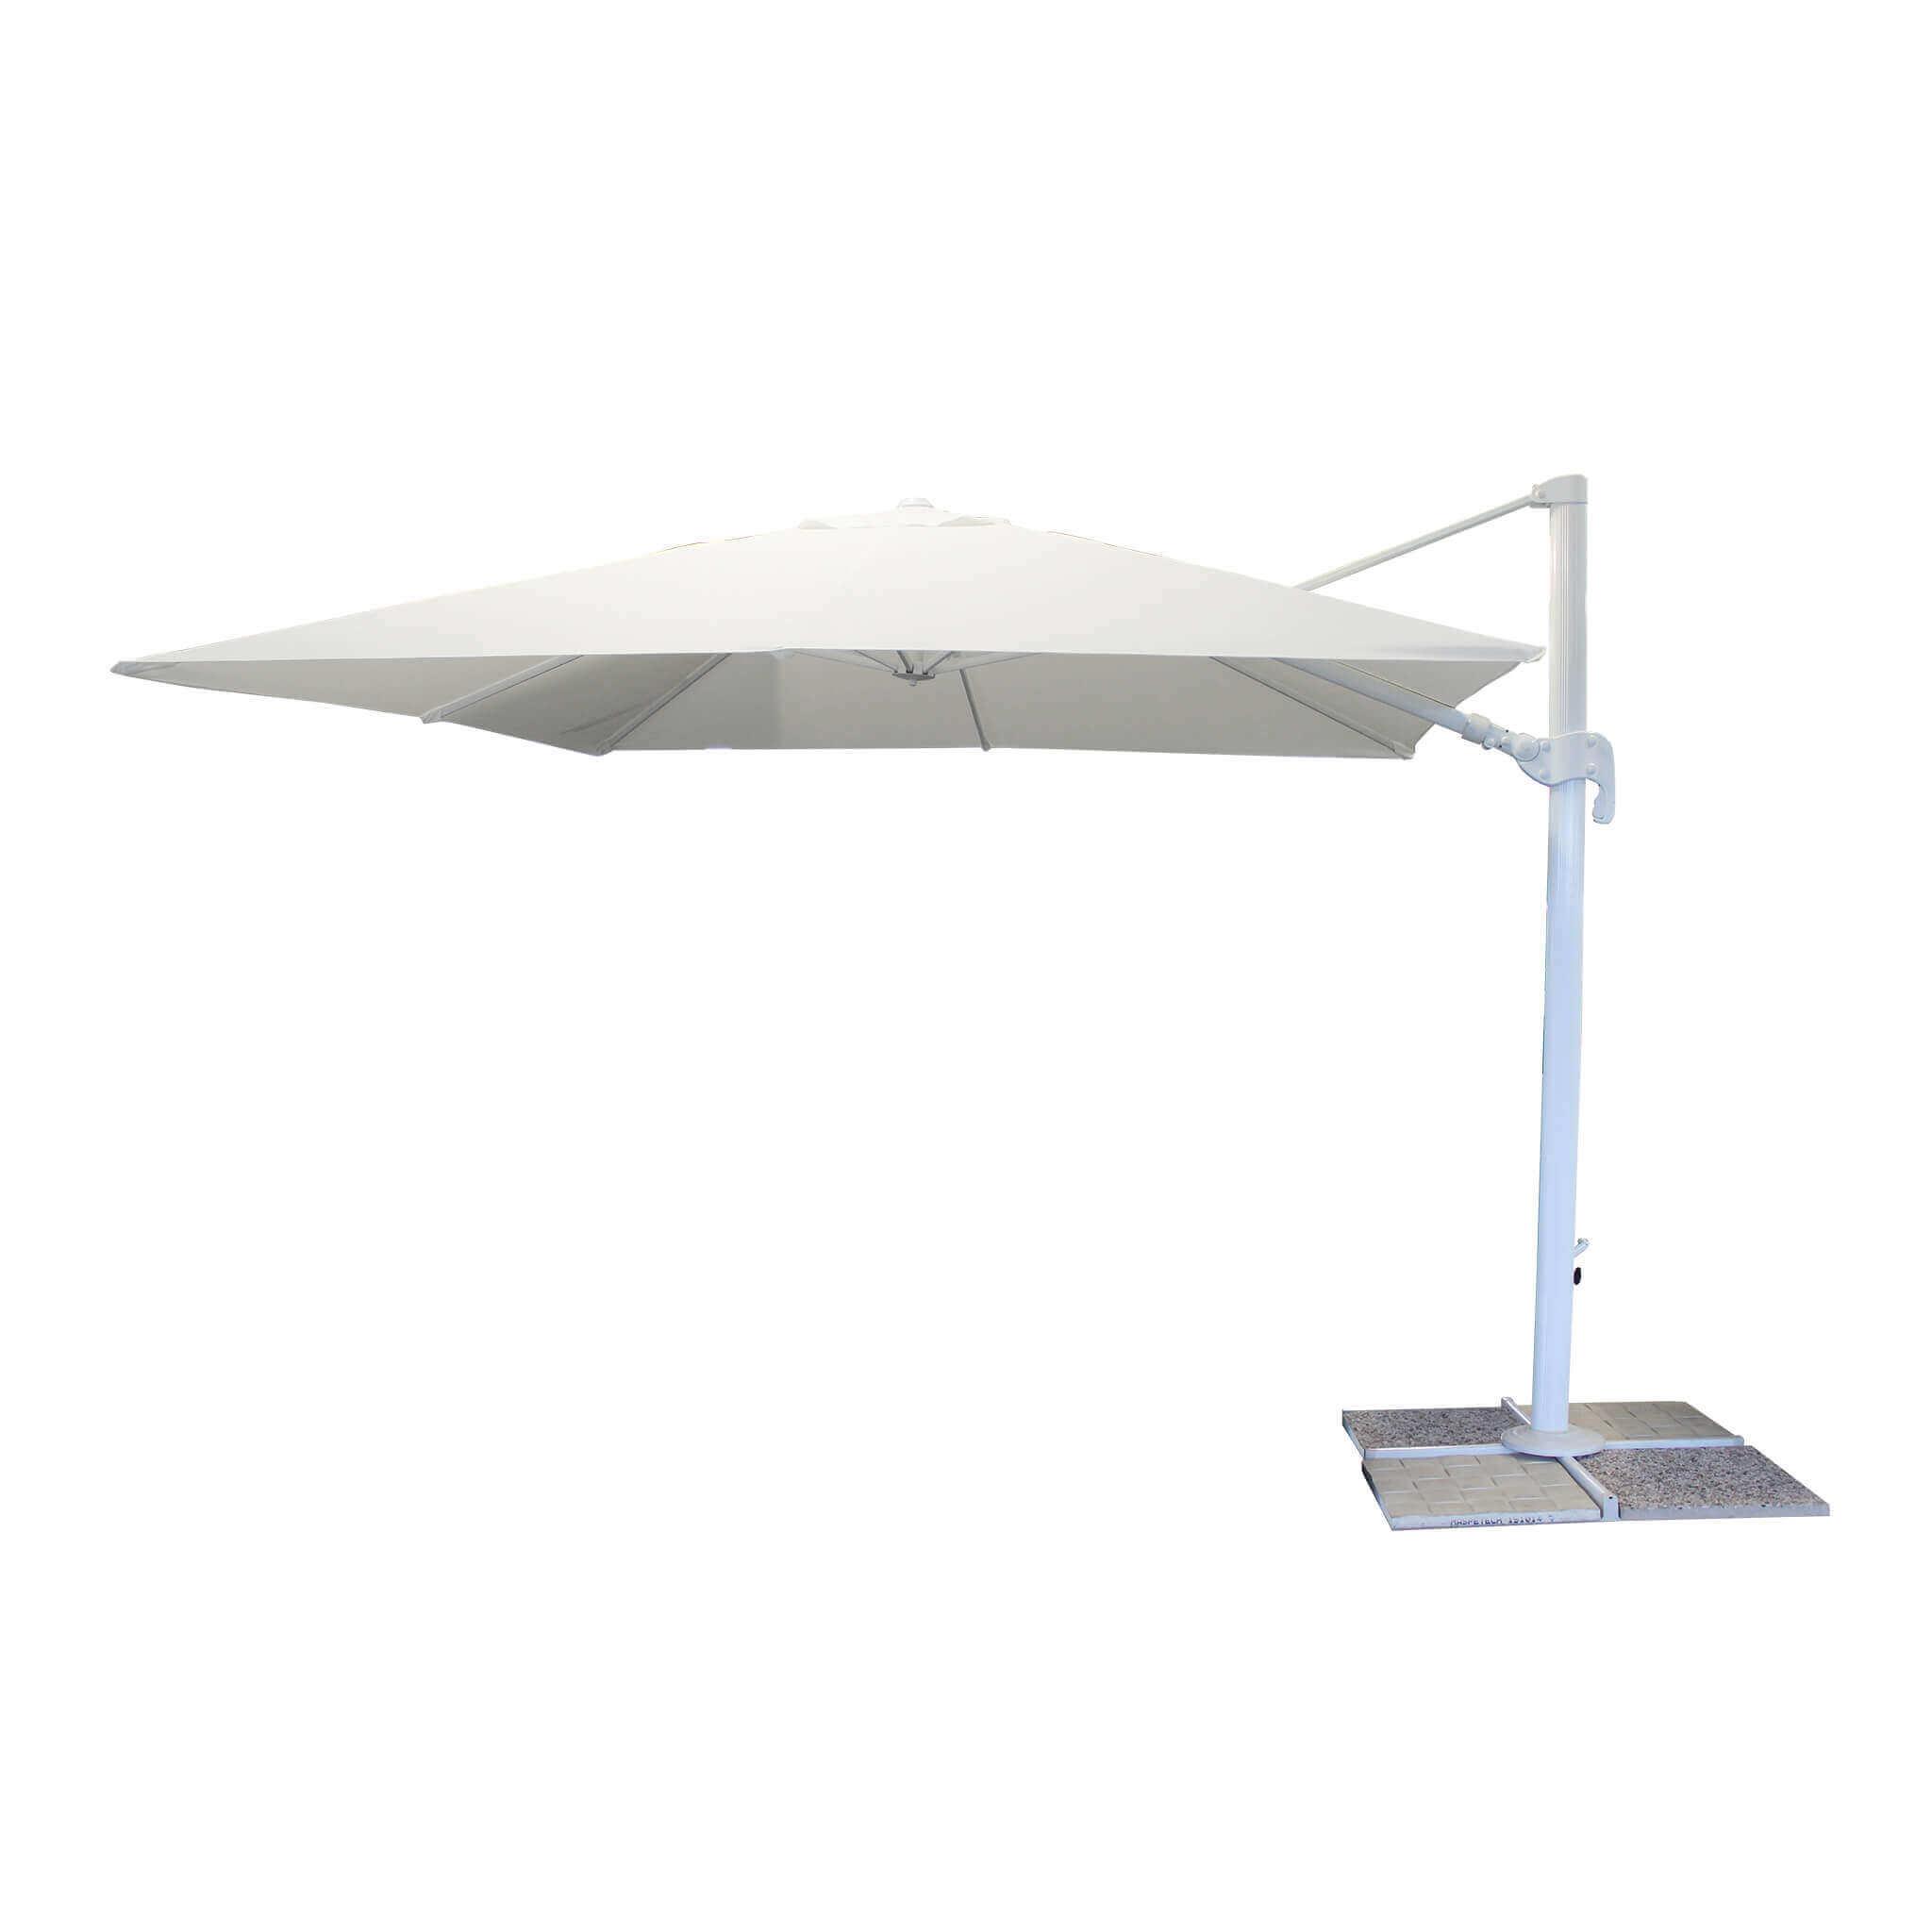 Milani Home SAGITTARIUS - ombrellone da giardino 3 x 3 decentrato